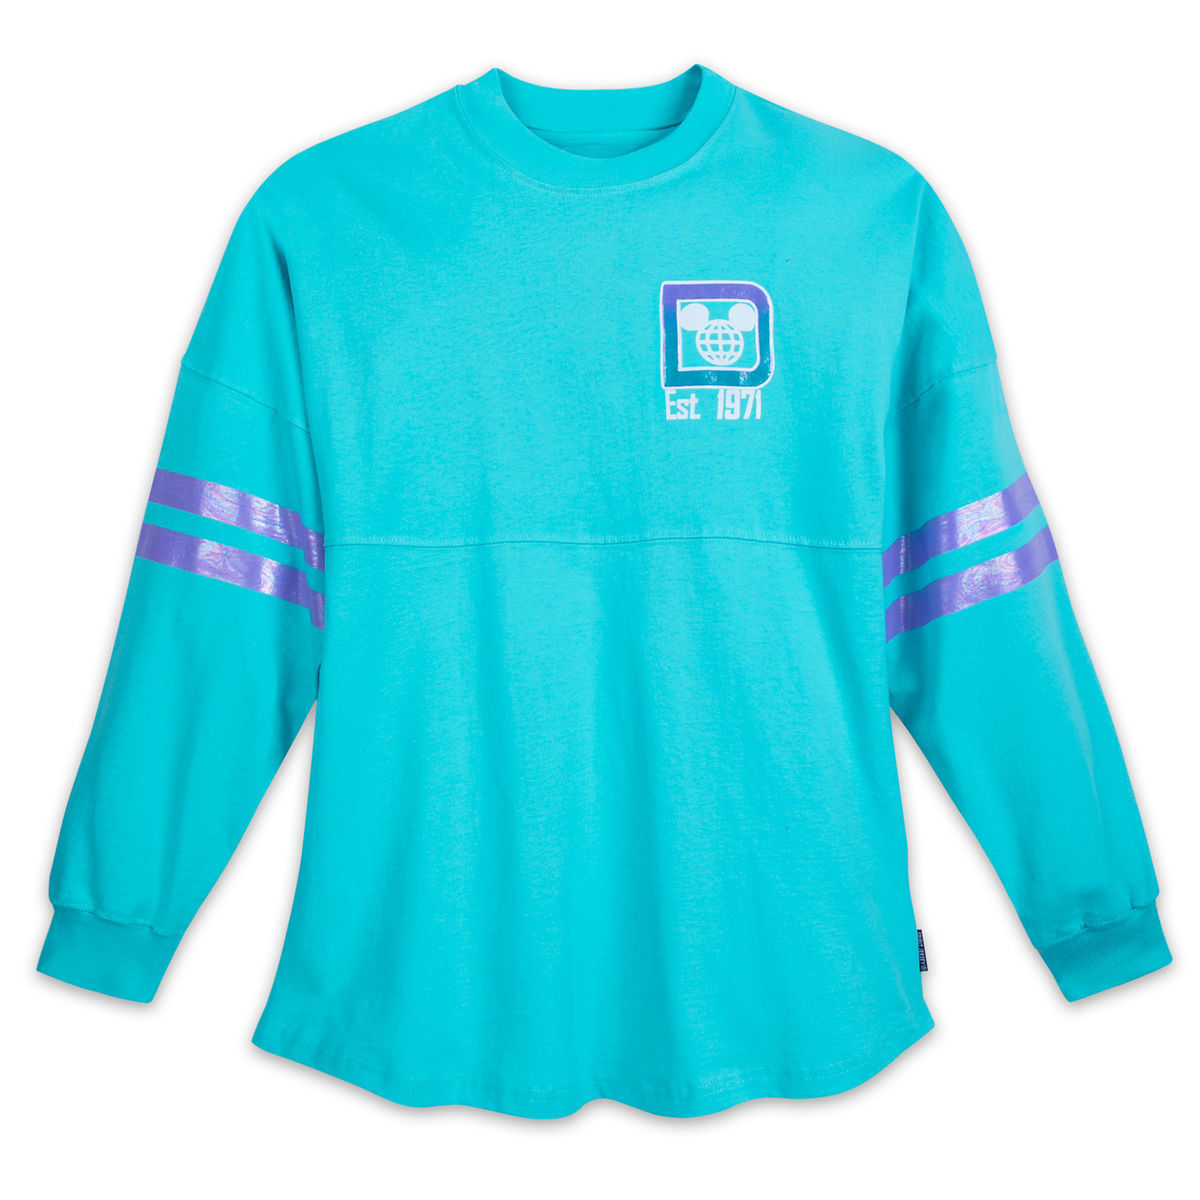 a5f9a34c6 Add to My Lists. Disney Adult Shirt - Walt Disney World Spirit Jersey -  Blue and Purple